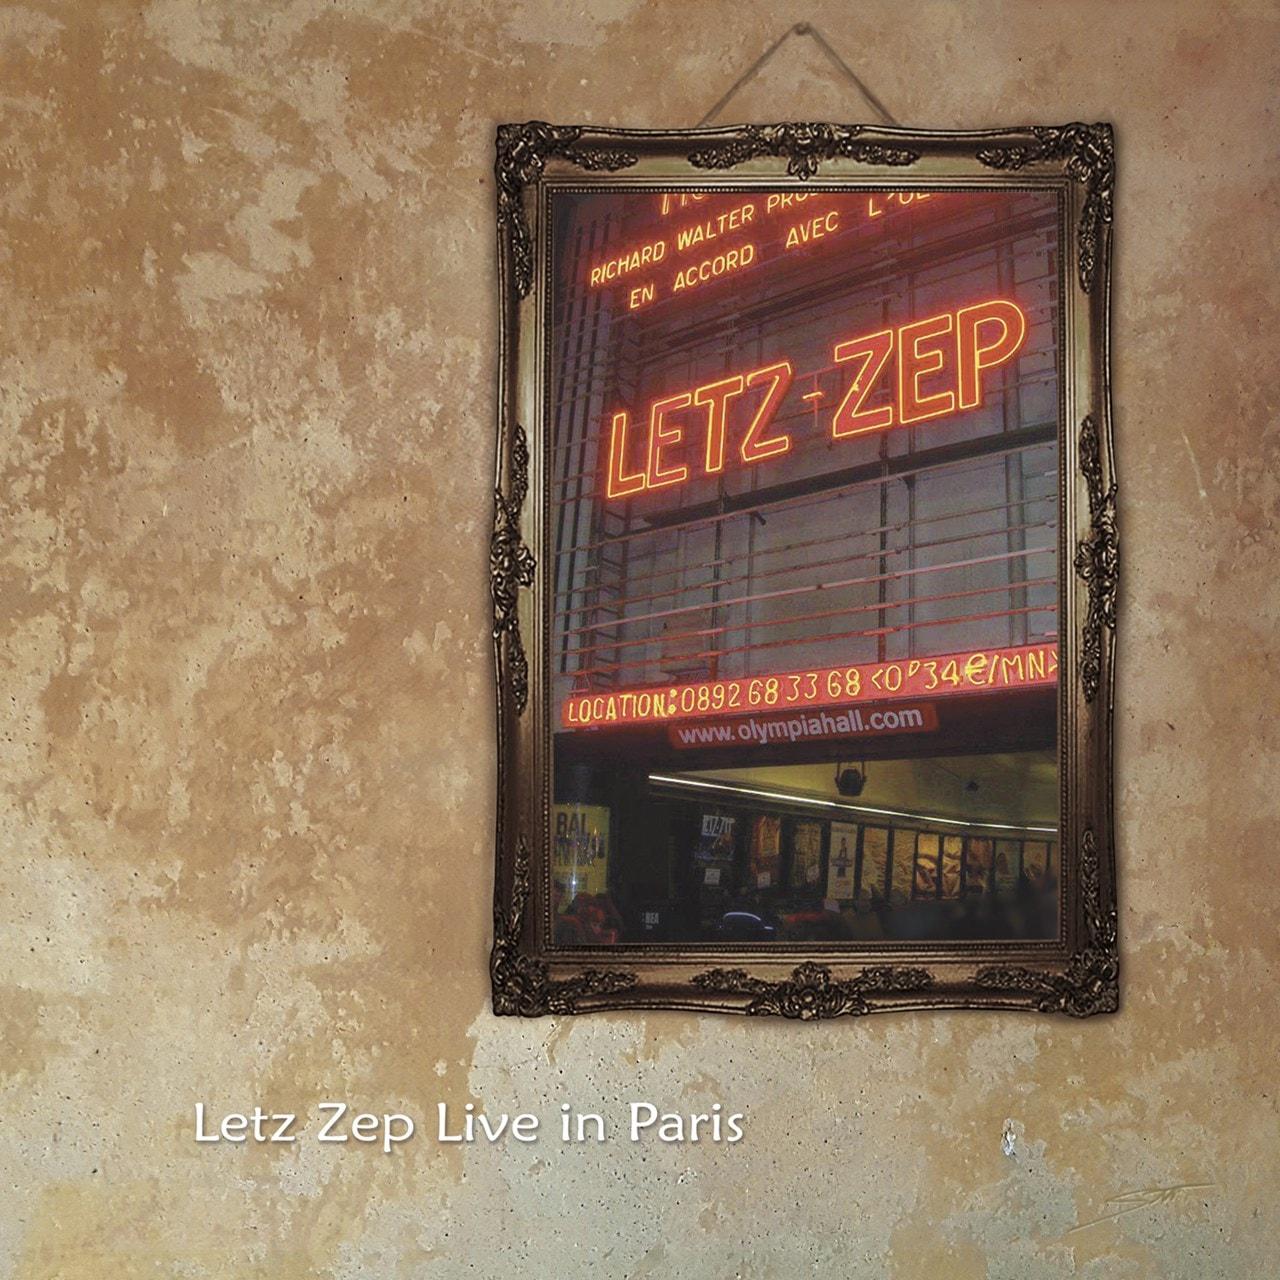 Letz Zep - Live in Paris - 1